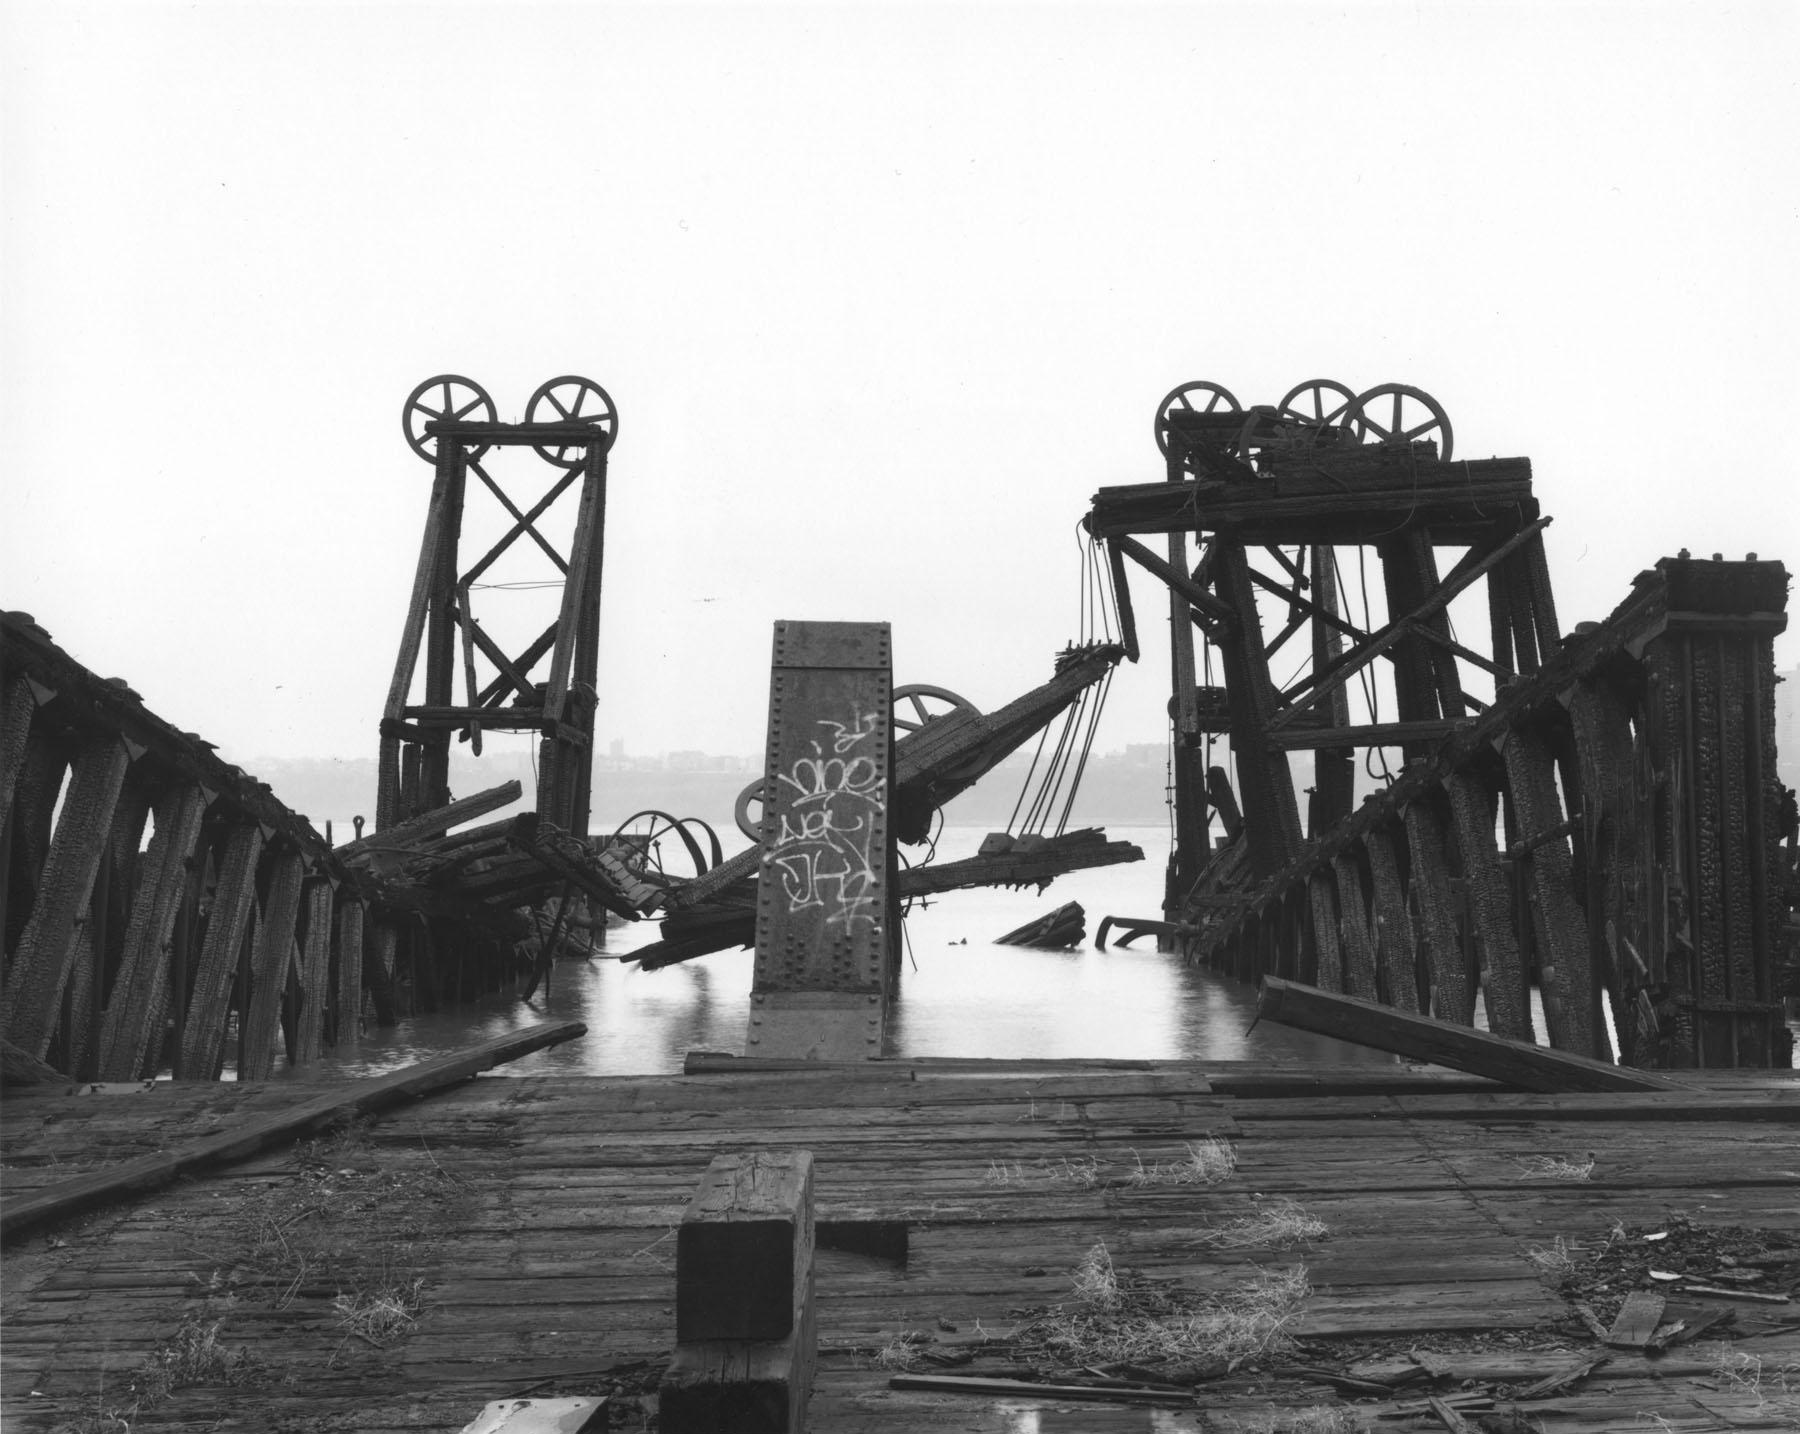 Barge Float Terminal, West Side Rail Yards, Manhattan, 1993